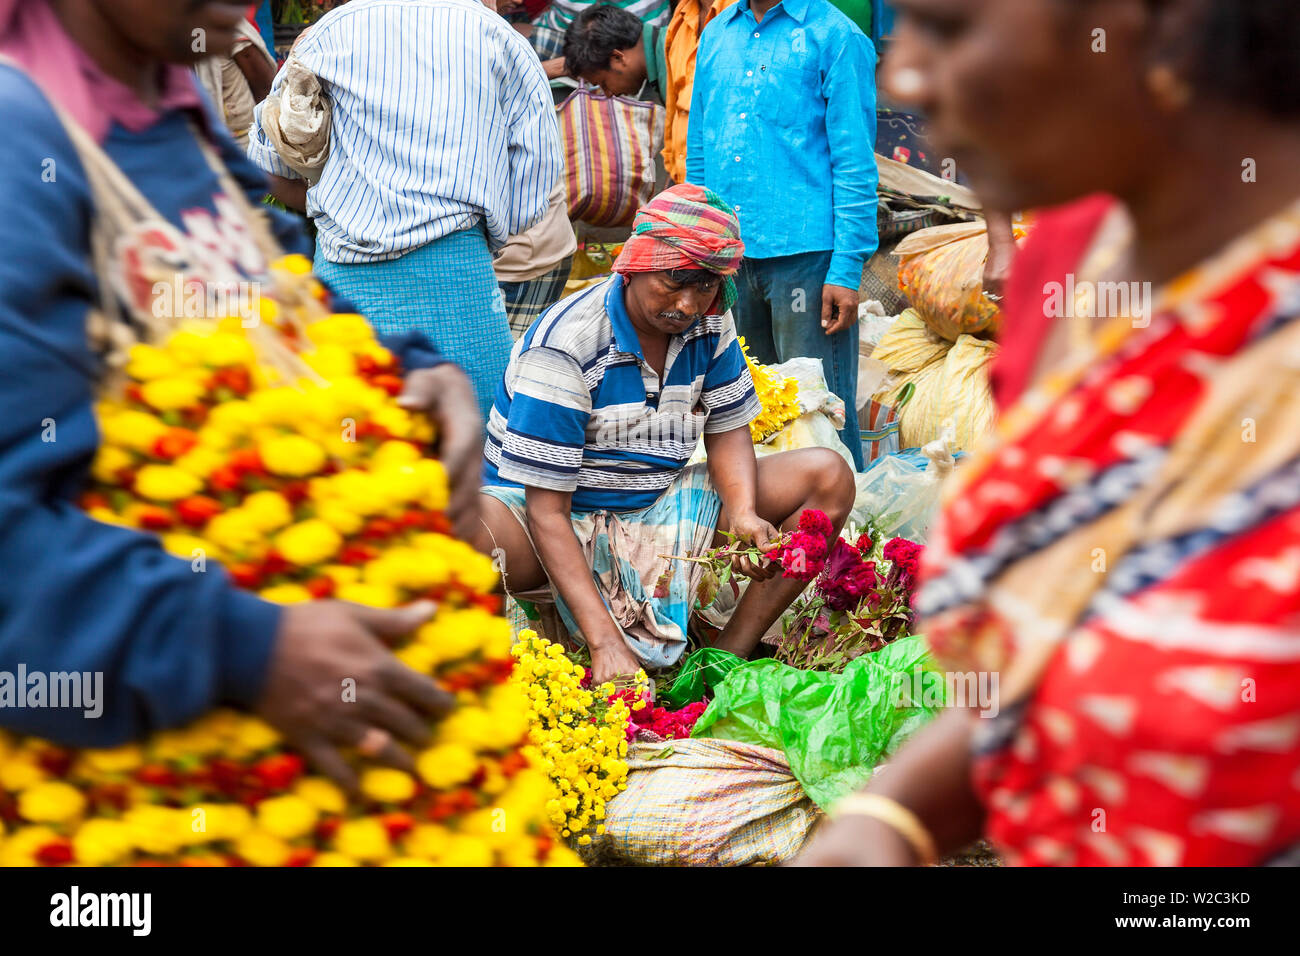 Flower market, Kolkata (Calcutta), India - Stock Image